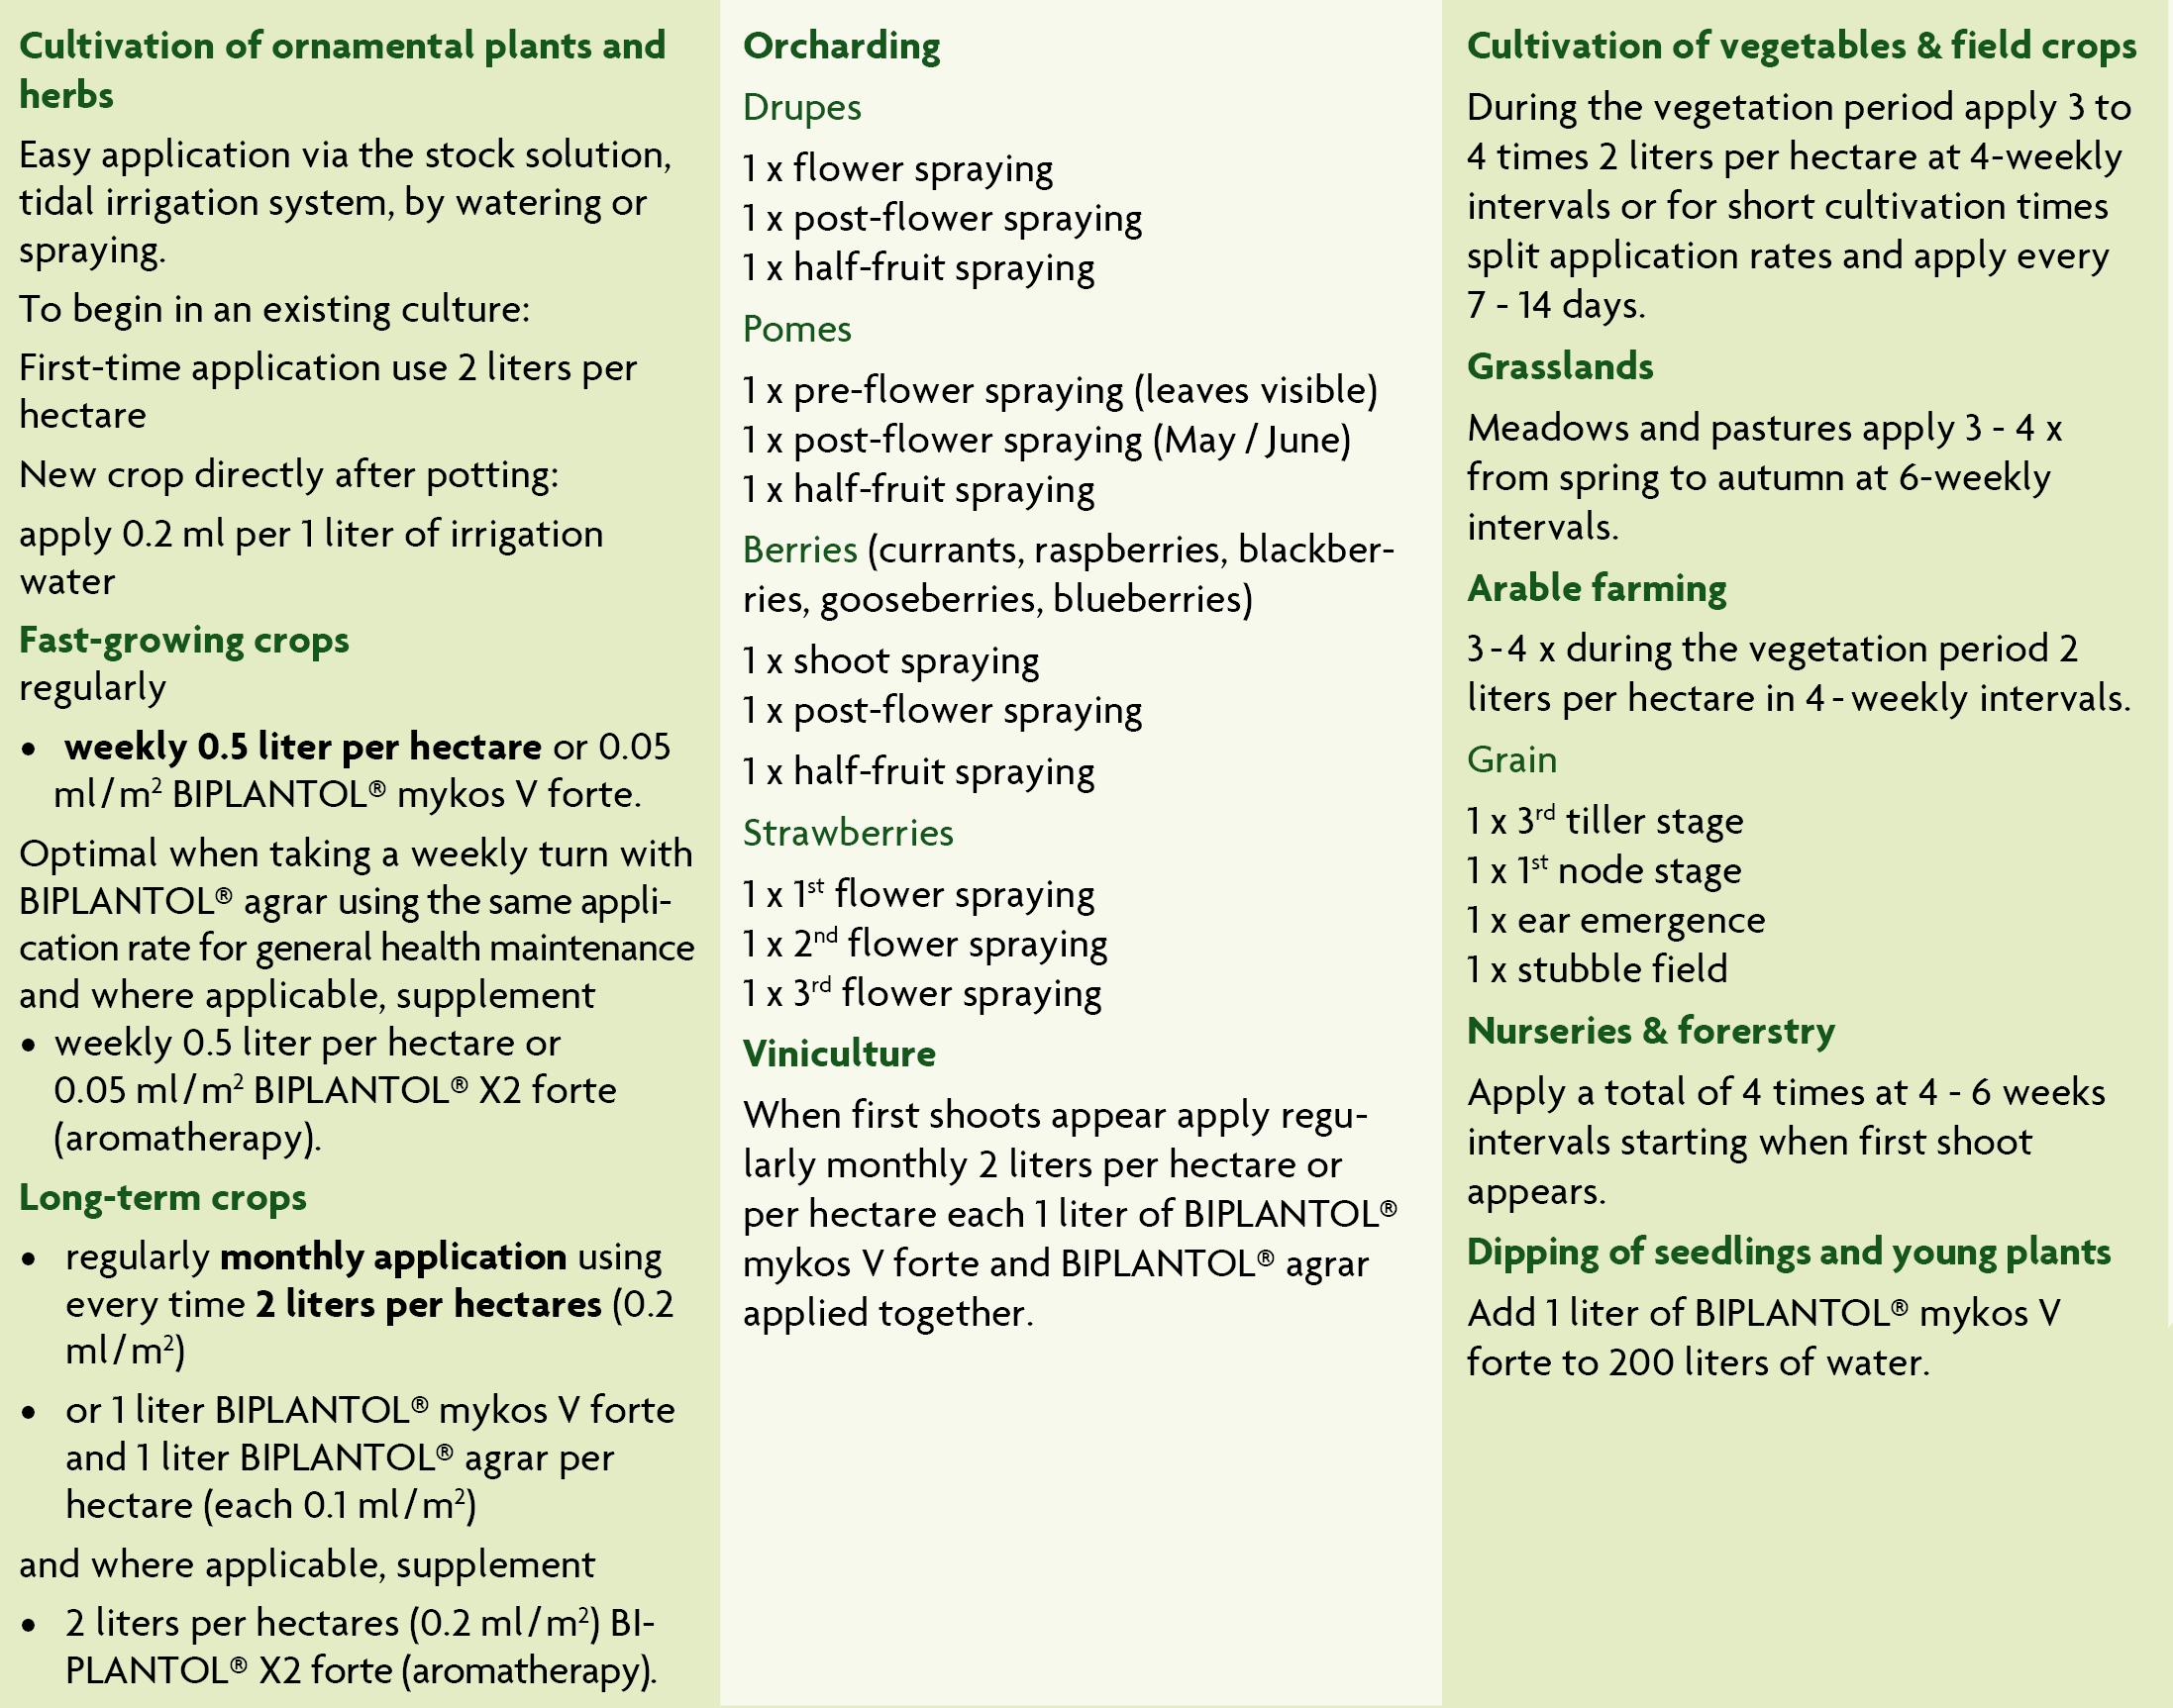 application biplantol mykos v forte